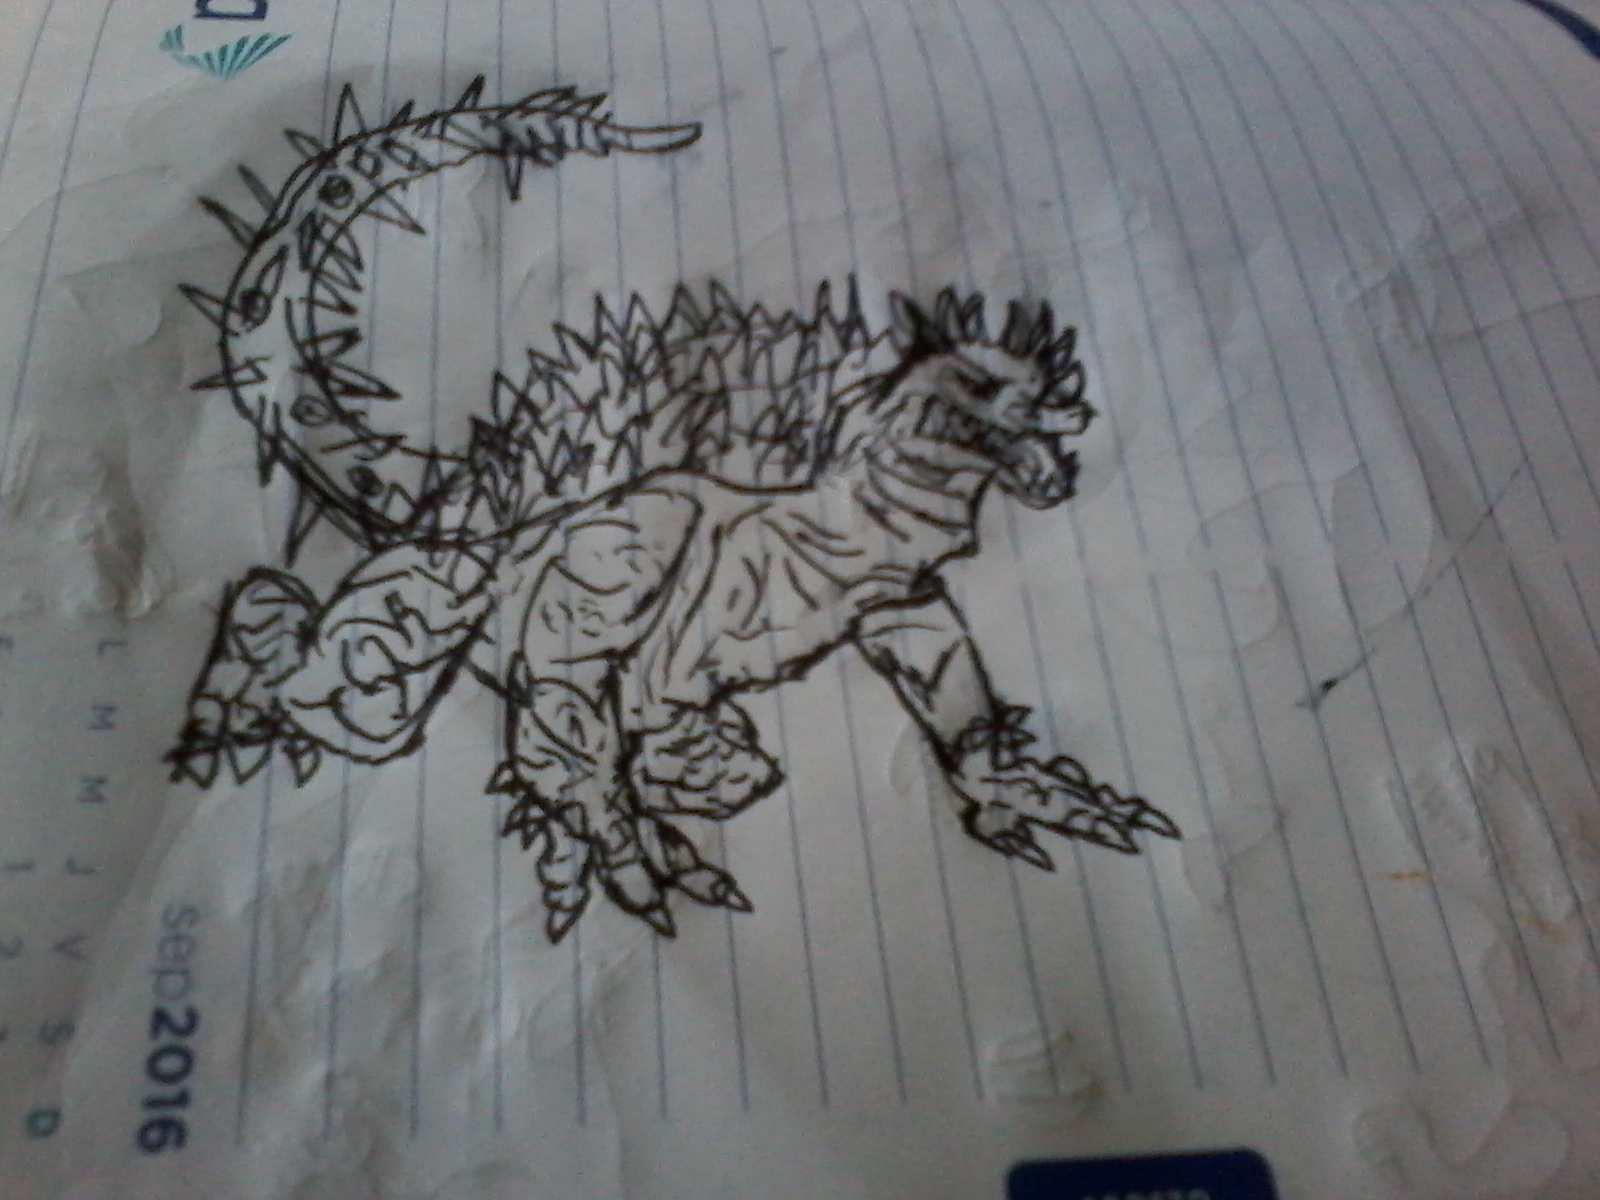 Dibujo de anguirus